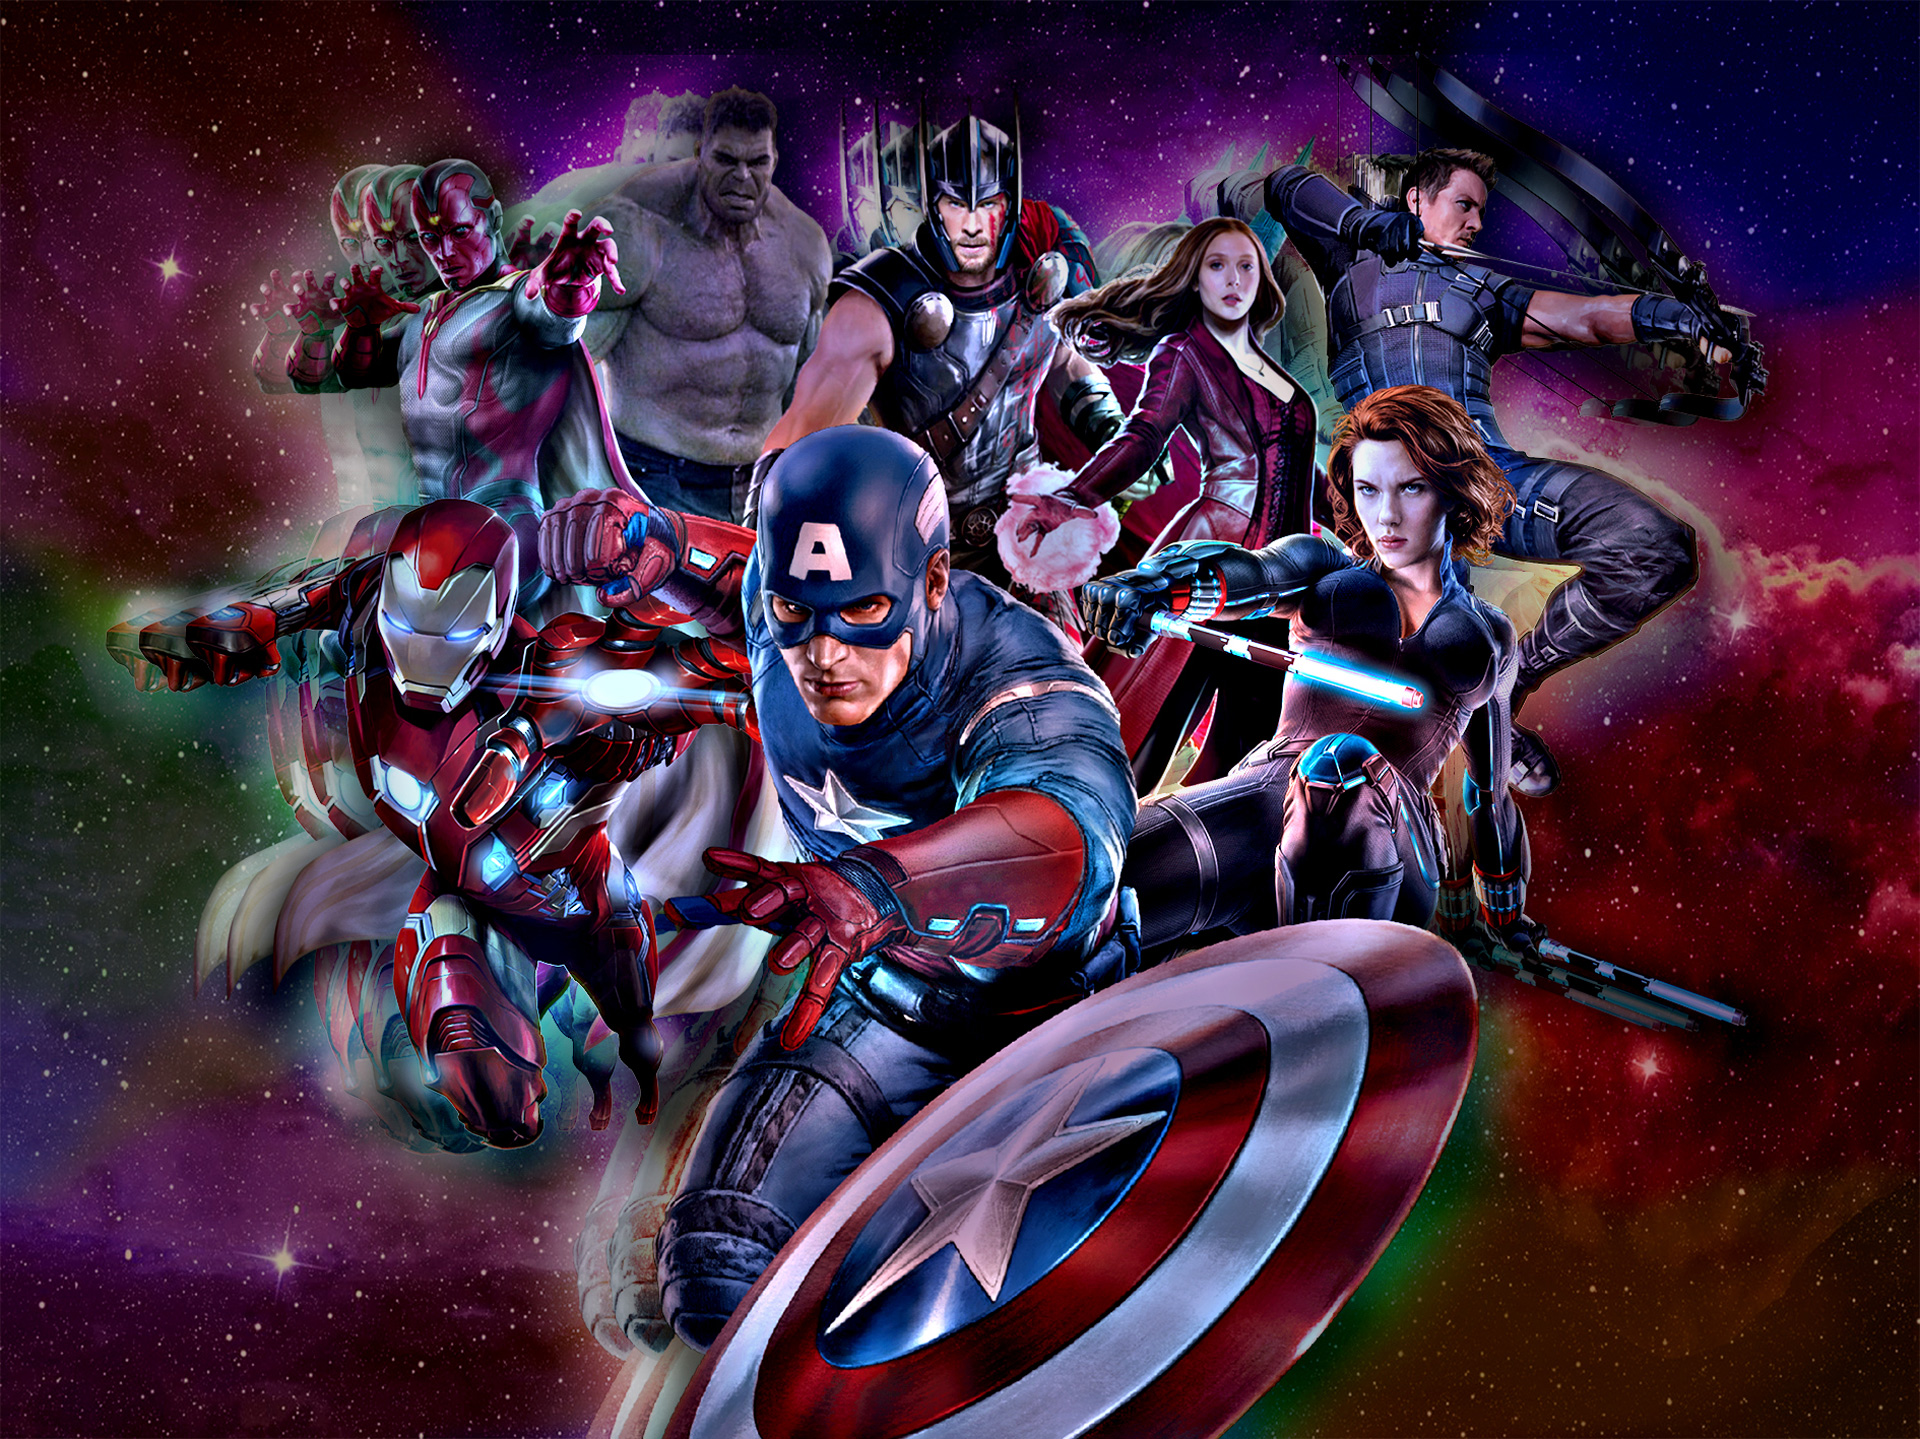 Avengers Infinity War Hd Wallpaper Background Image 1920x1439 Id 972060 Wallpaper Abyss